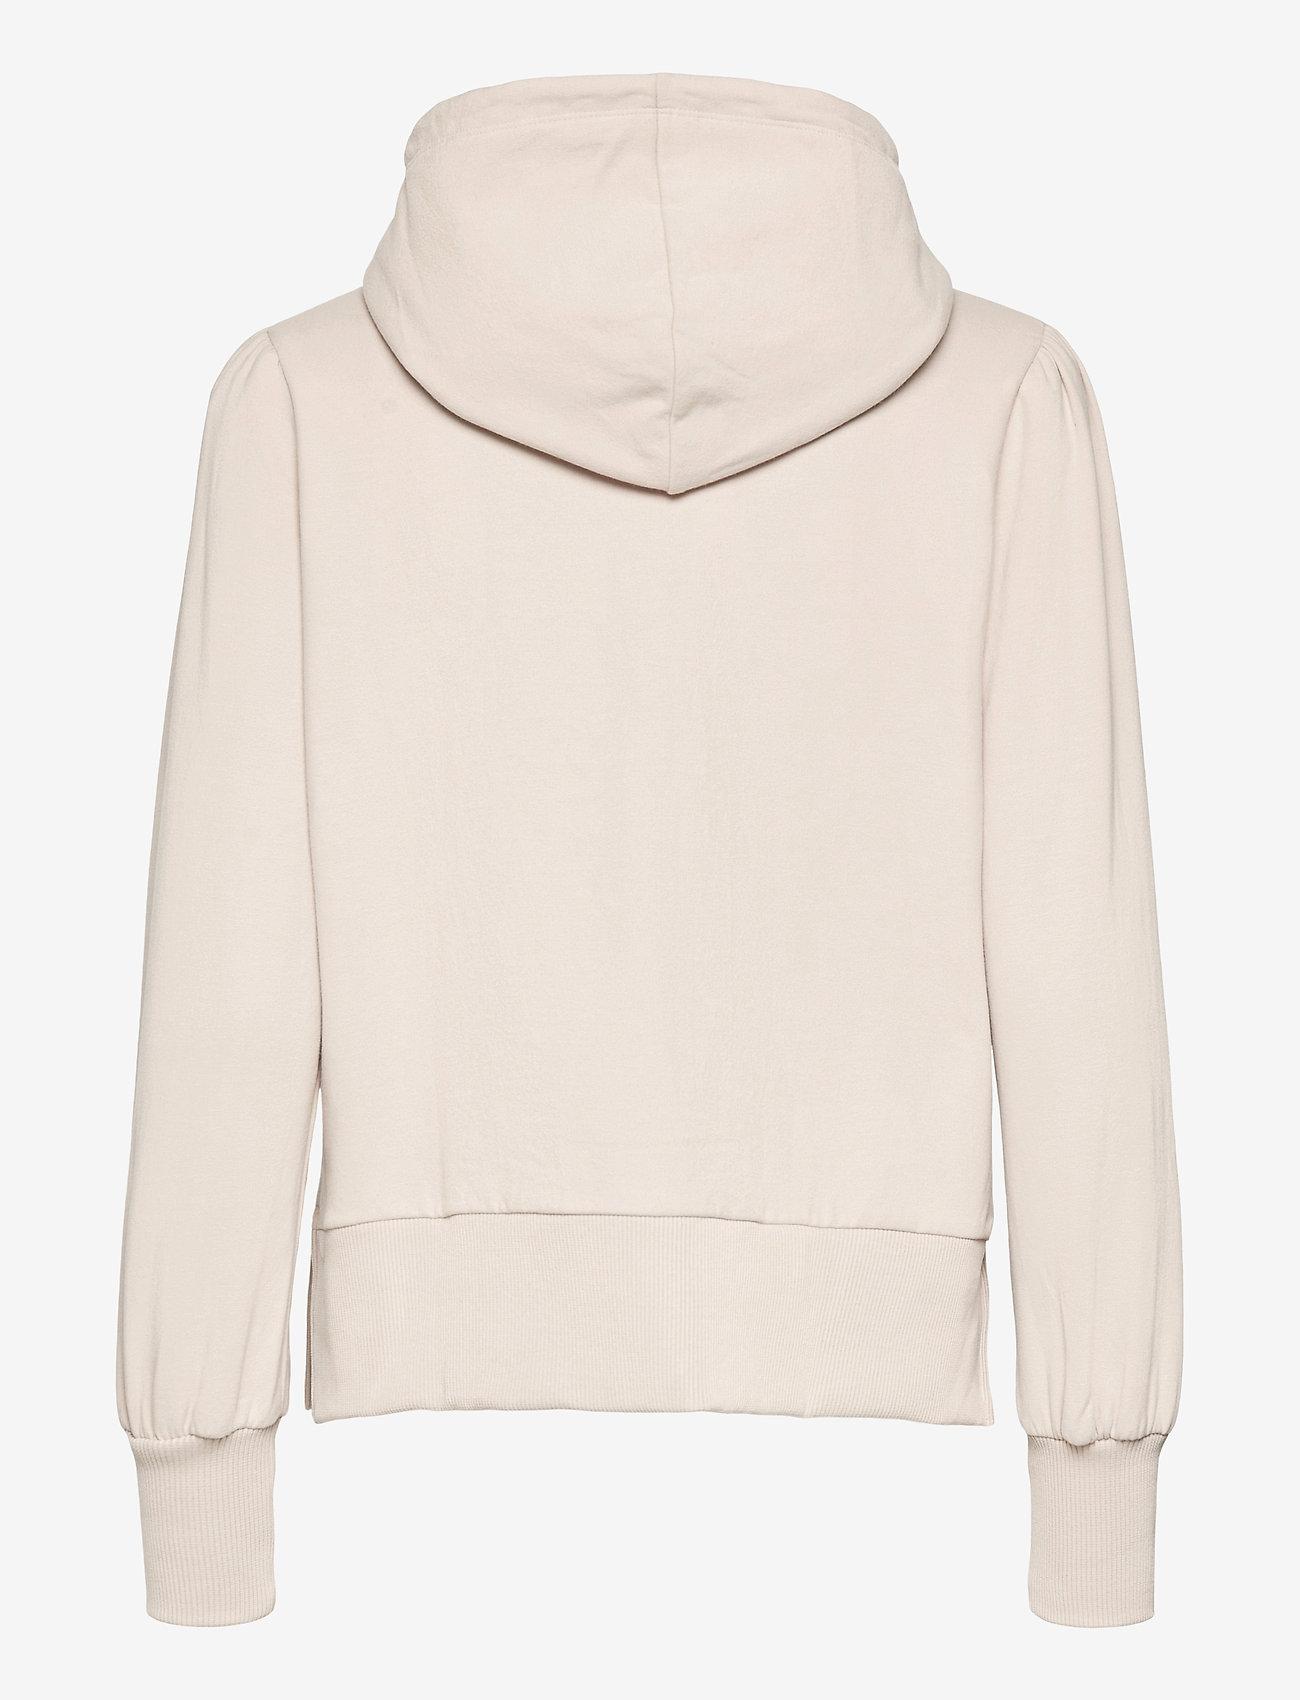 ella&il - Mimmi hoodie - pulls à capuche - beige - 1